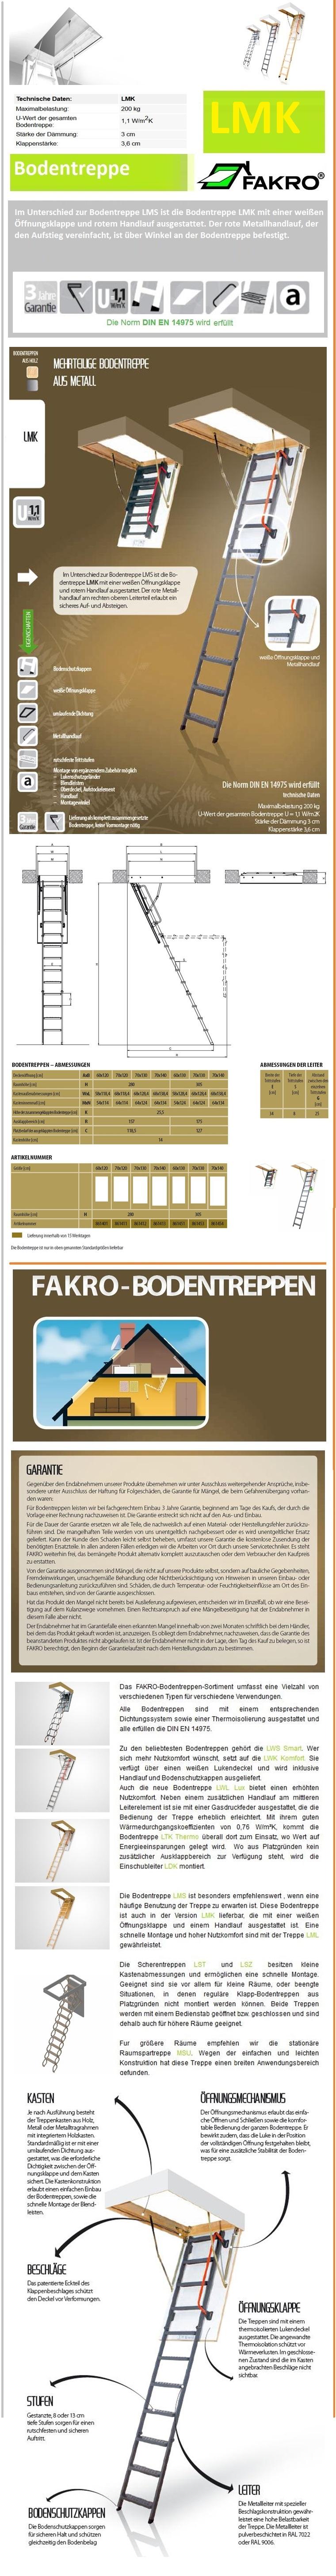 Bodenklapptreppe LMK Fakro aus Metall